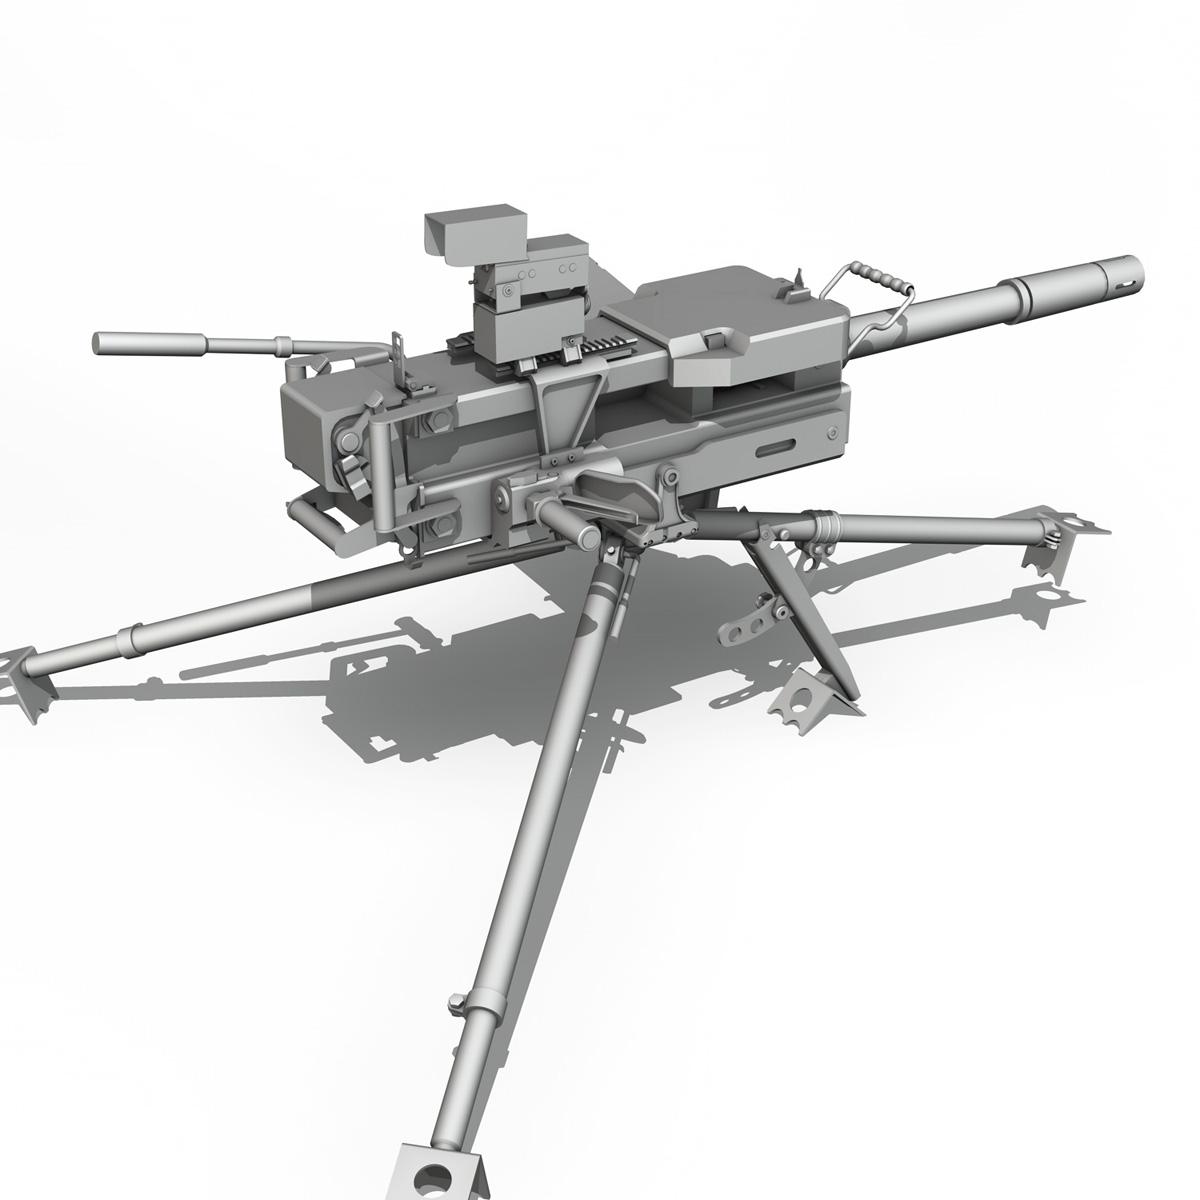 40mm qumbara pulemyotu gmg 3d model c4d lwo 3dm obj 264300